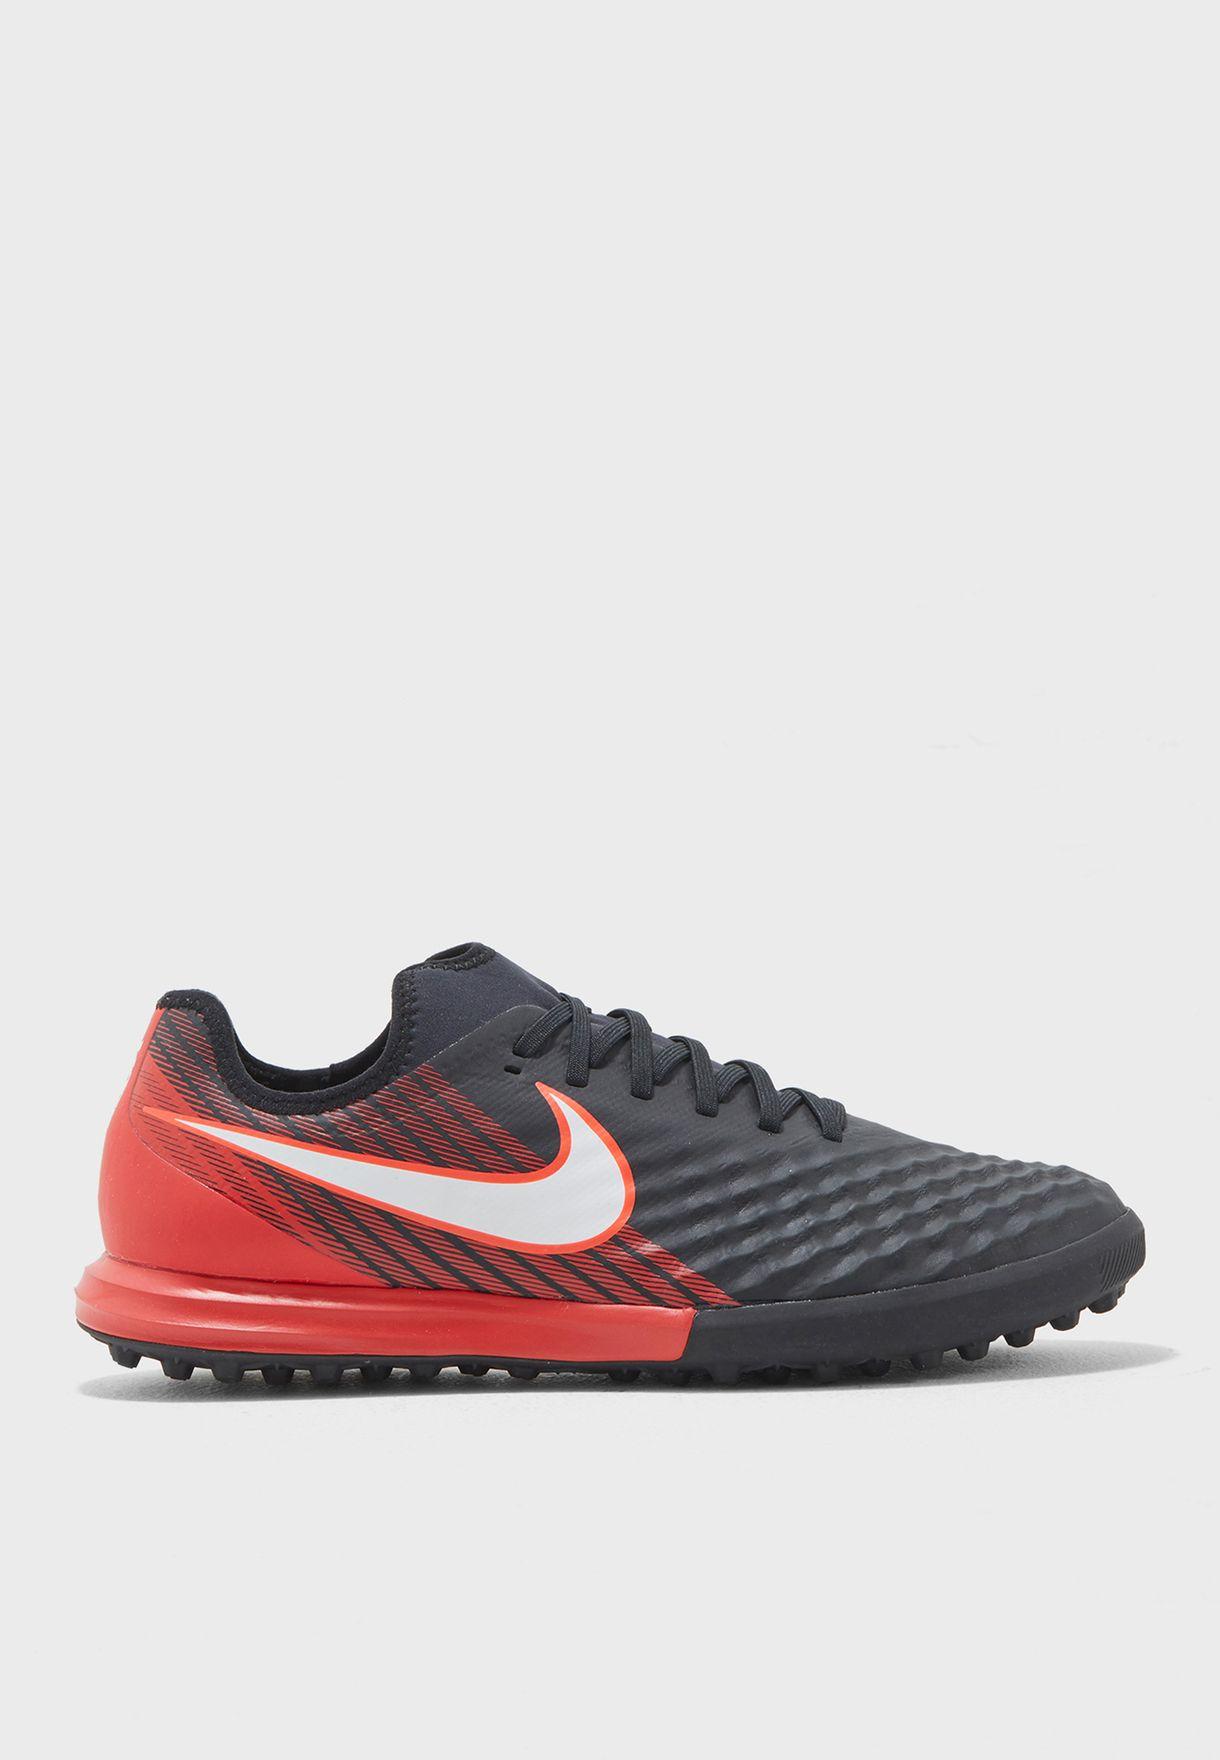 6a39f1793fc2 Shop Nike black Magistax Finale II TF 844446-061 for Men in Saudi ...